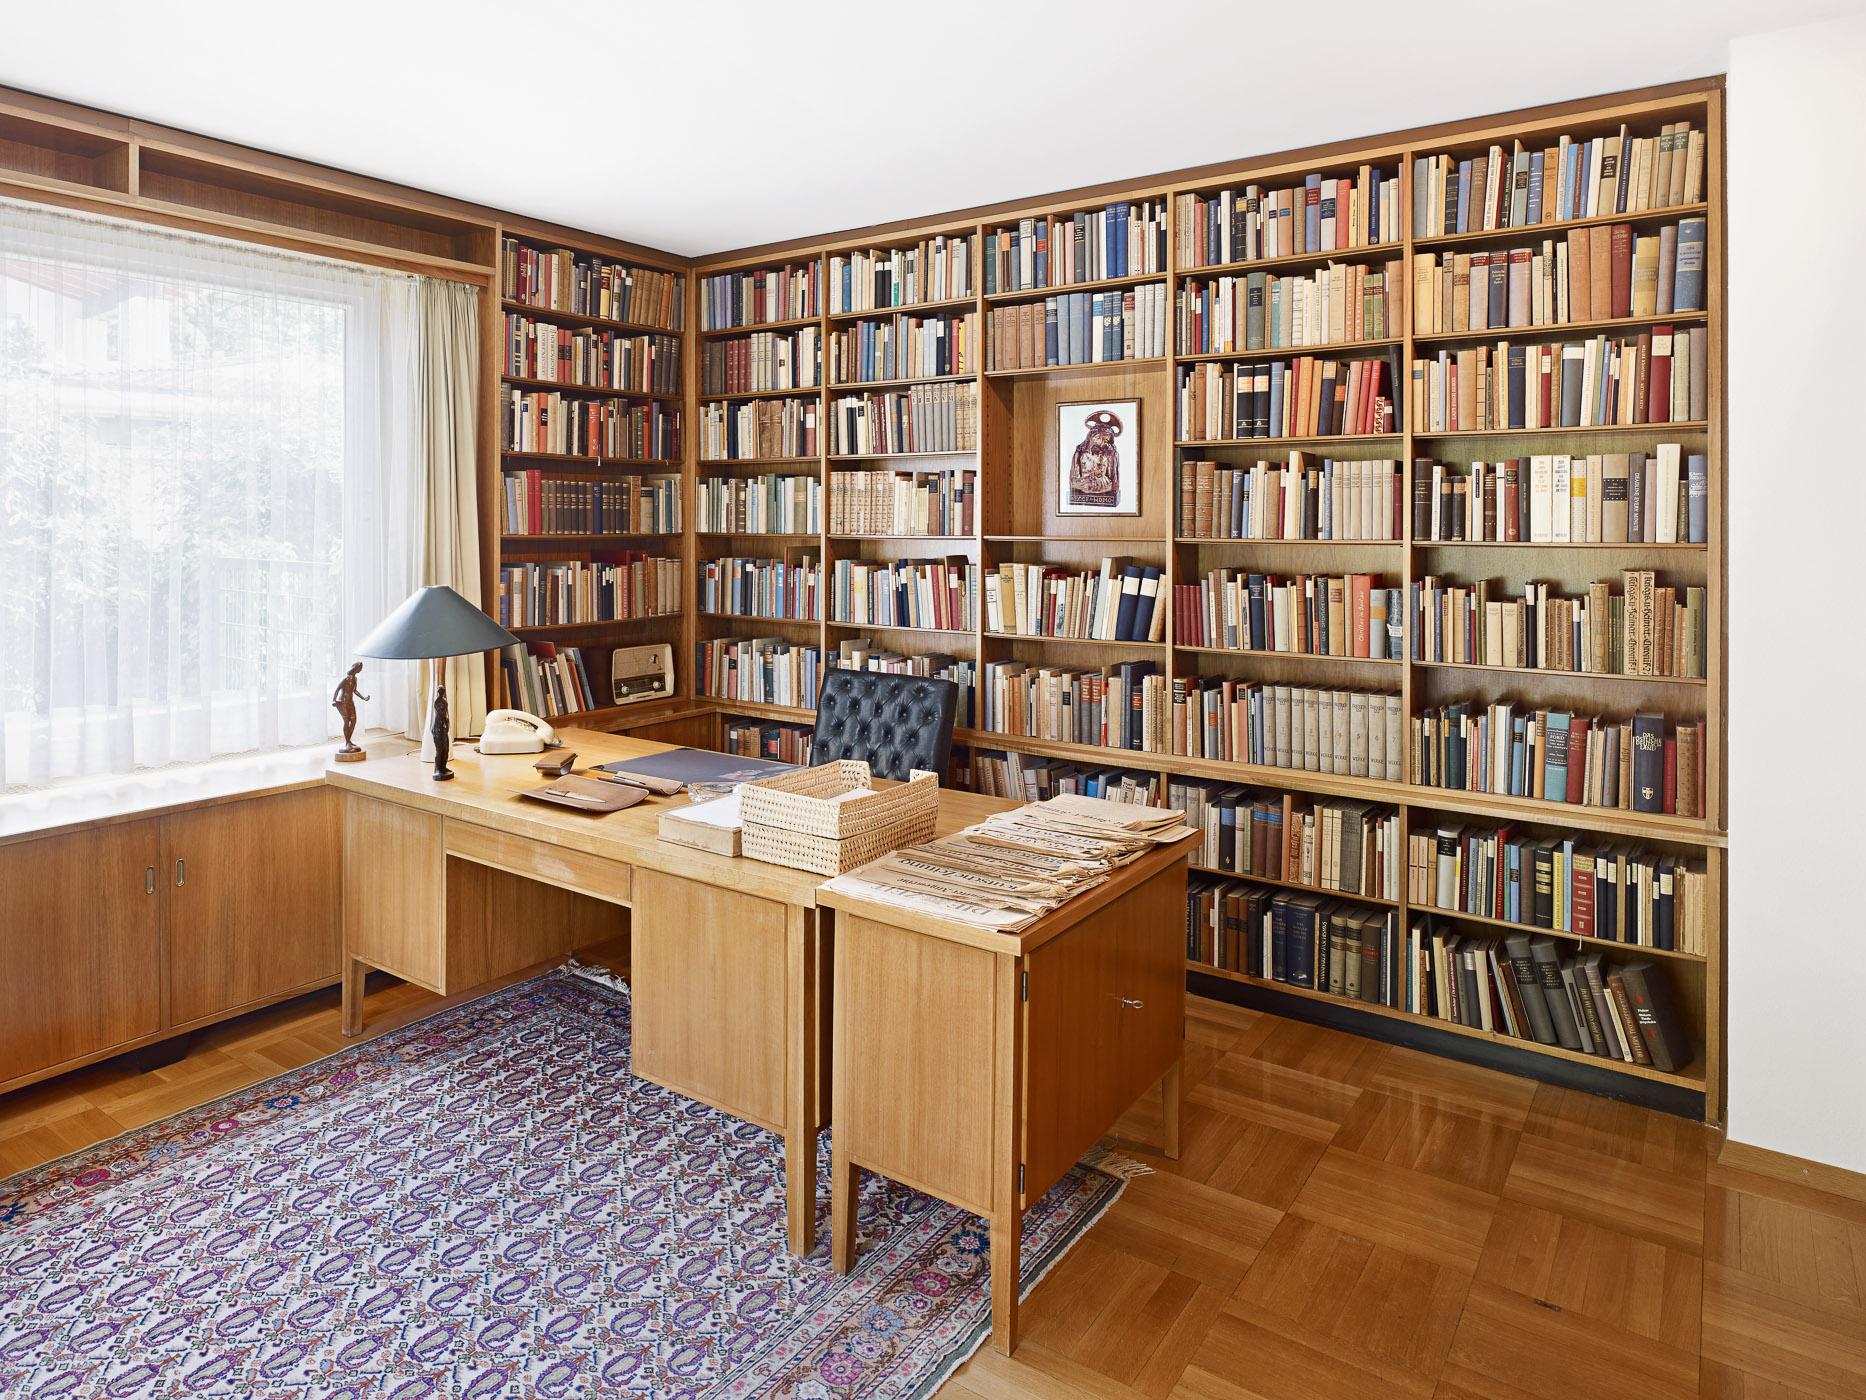 040-Theodor-Heuss-Haus-Stuttgart-2.jpg